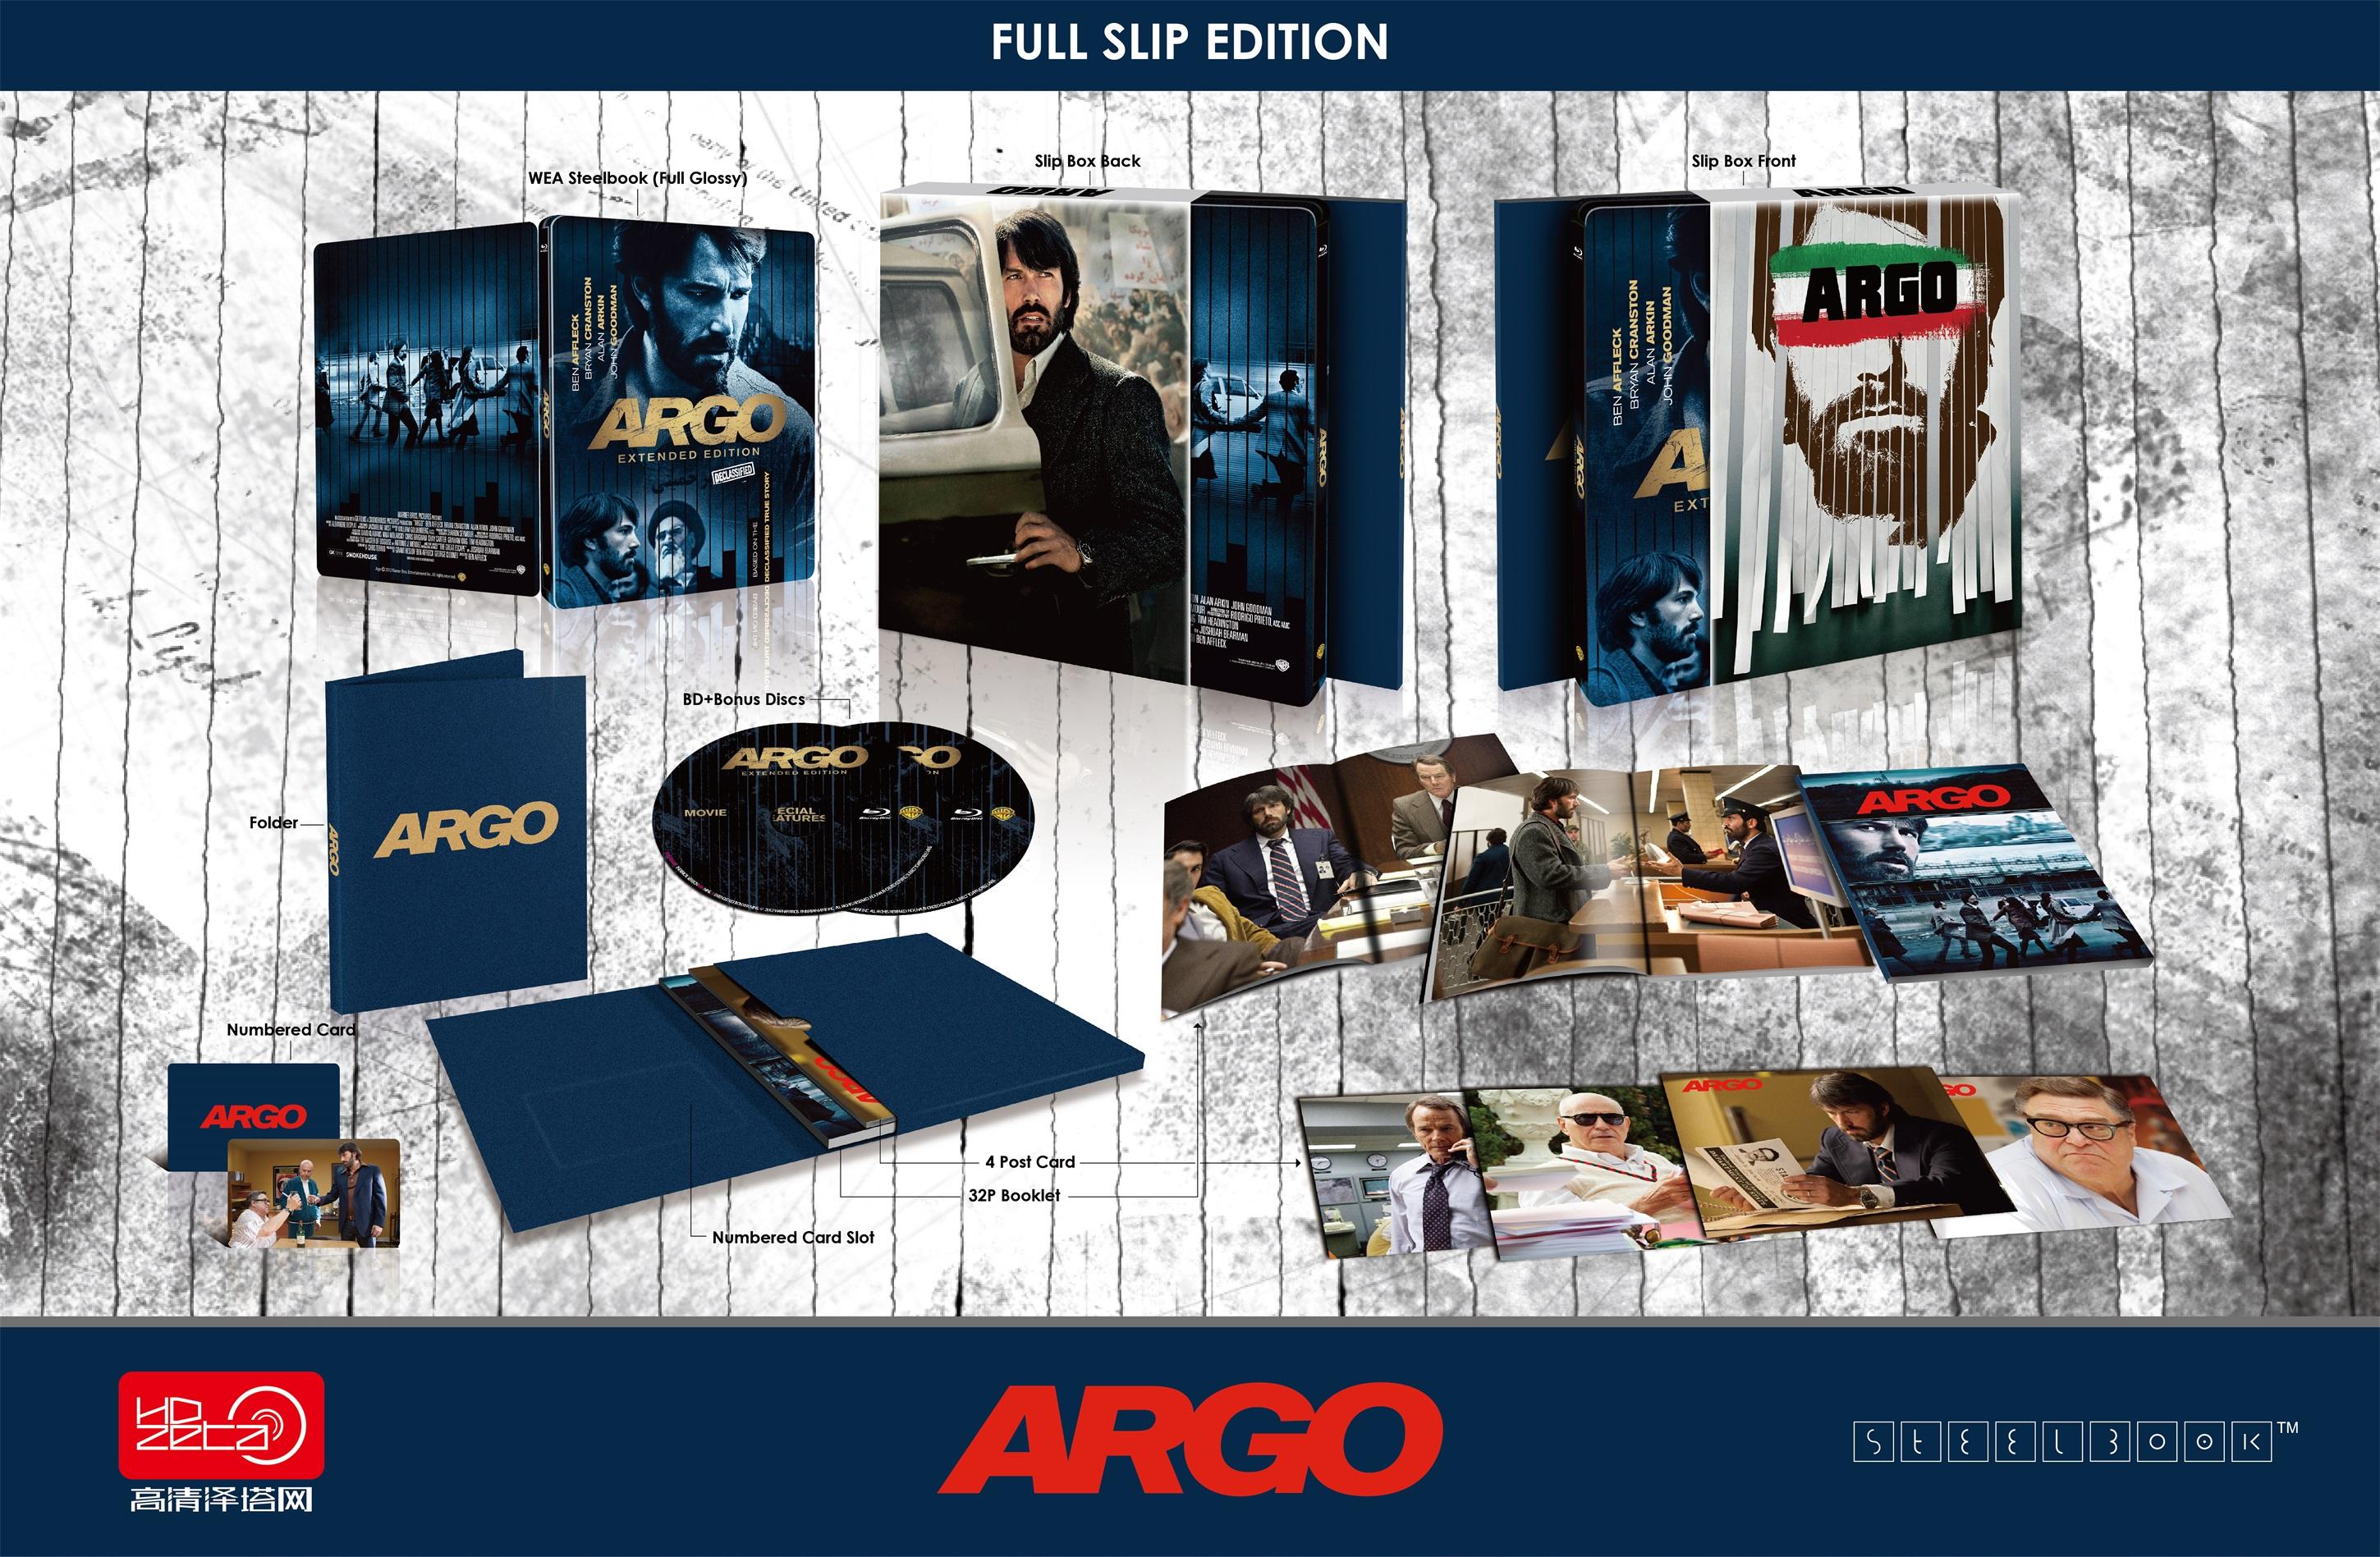 Argo Extended Cut HDzeta Exclsive Fulllsip Edition